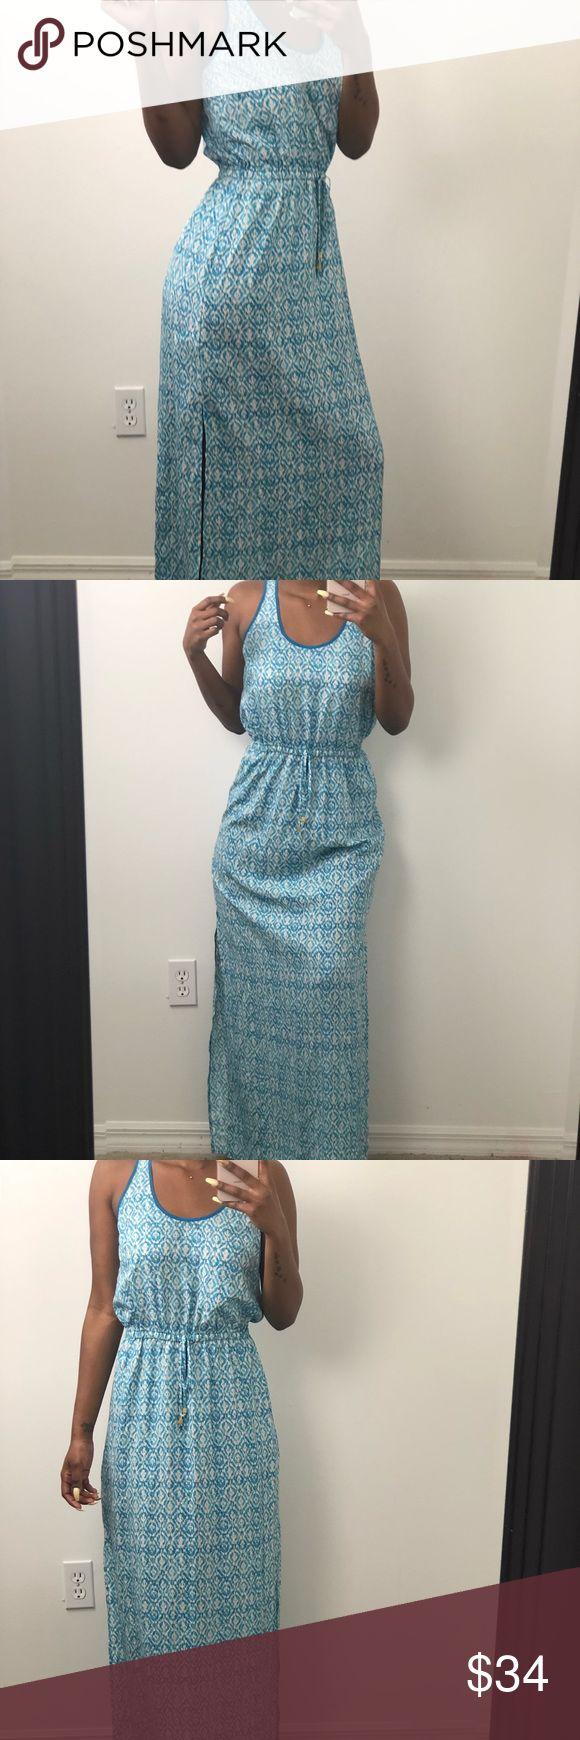 michael kors light blue and white maxi dress size small, runs big, fits more like a medium.  has a slit on both sides Michael Kors Dresses Maxi